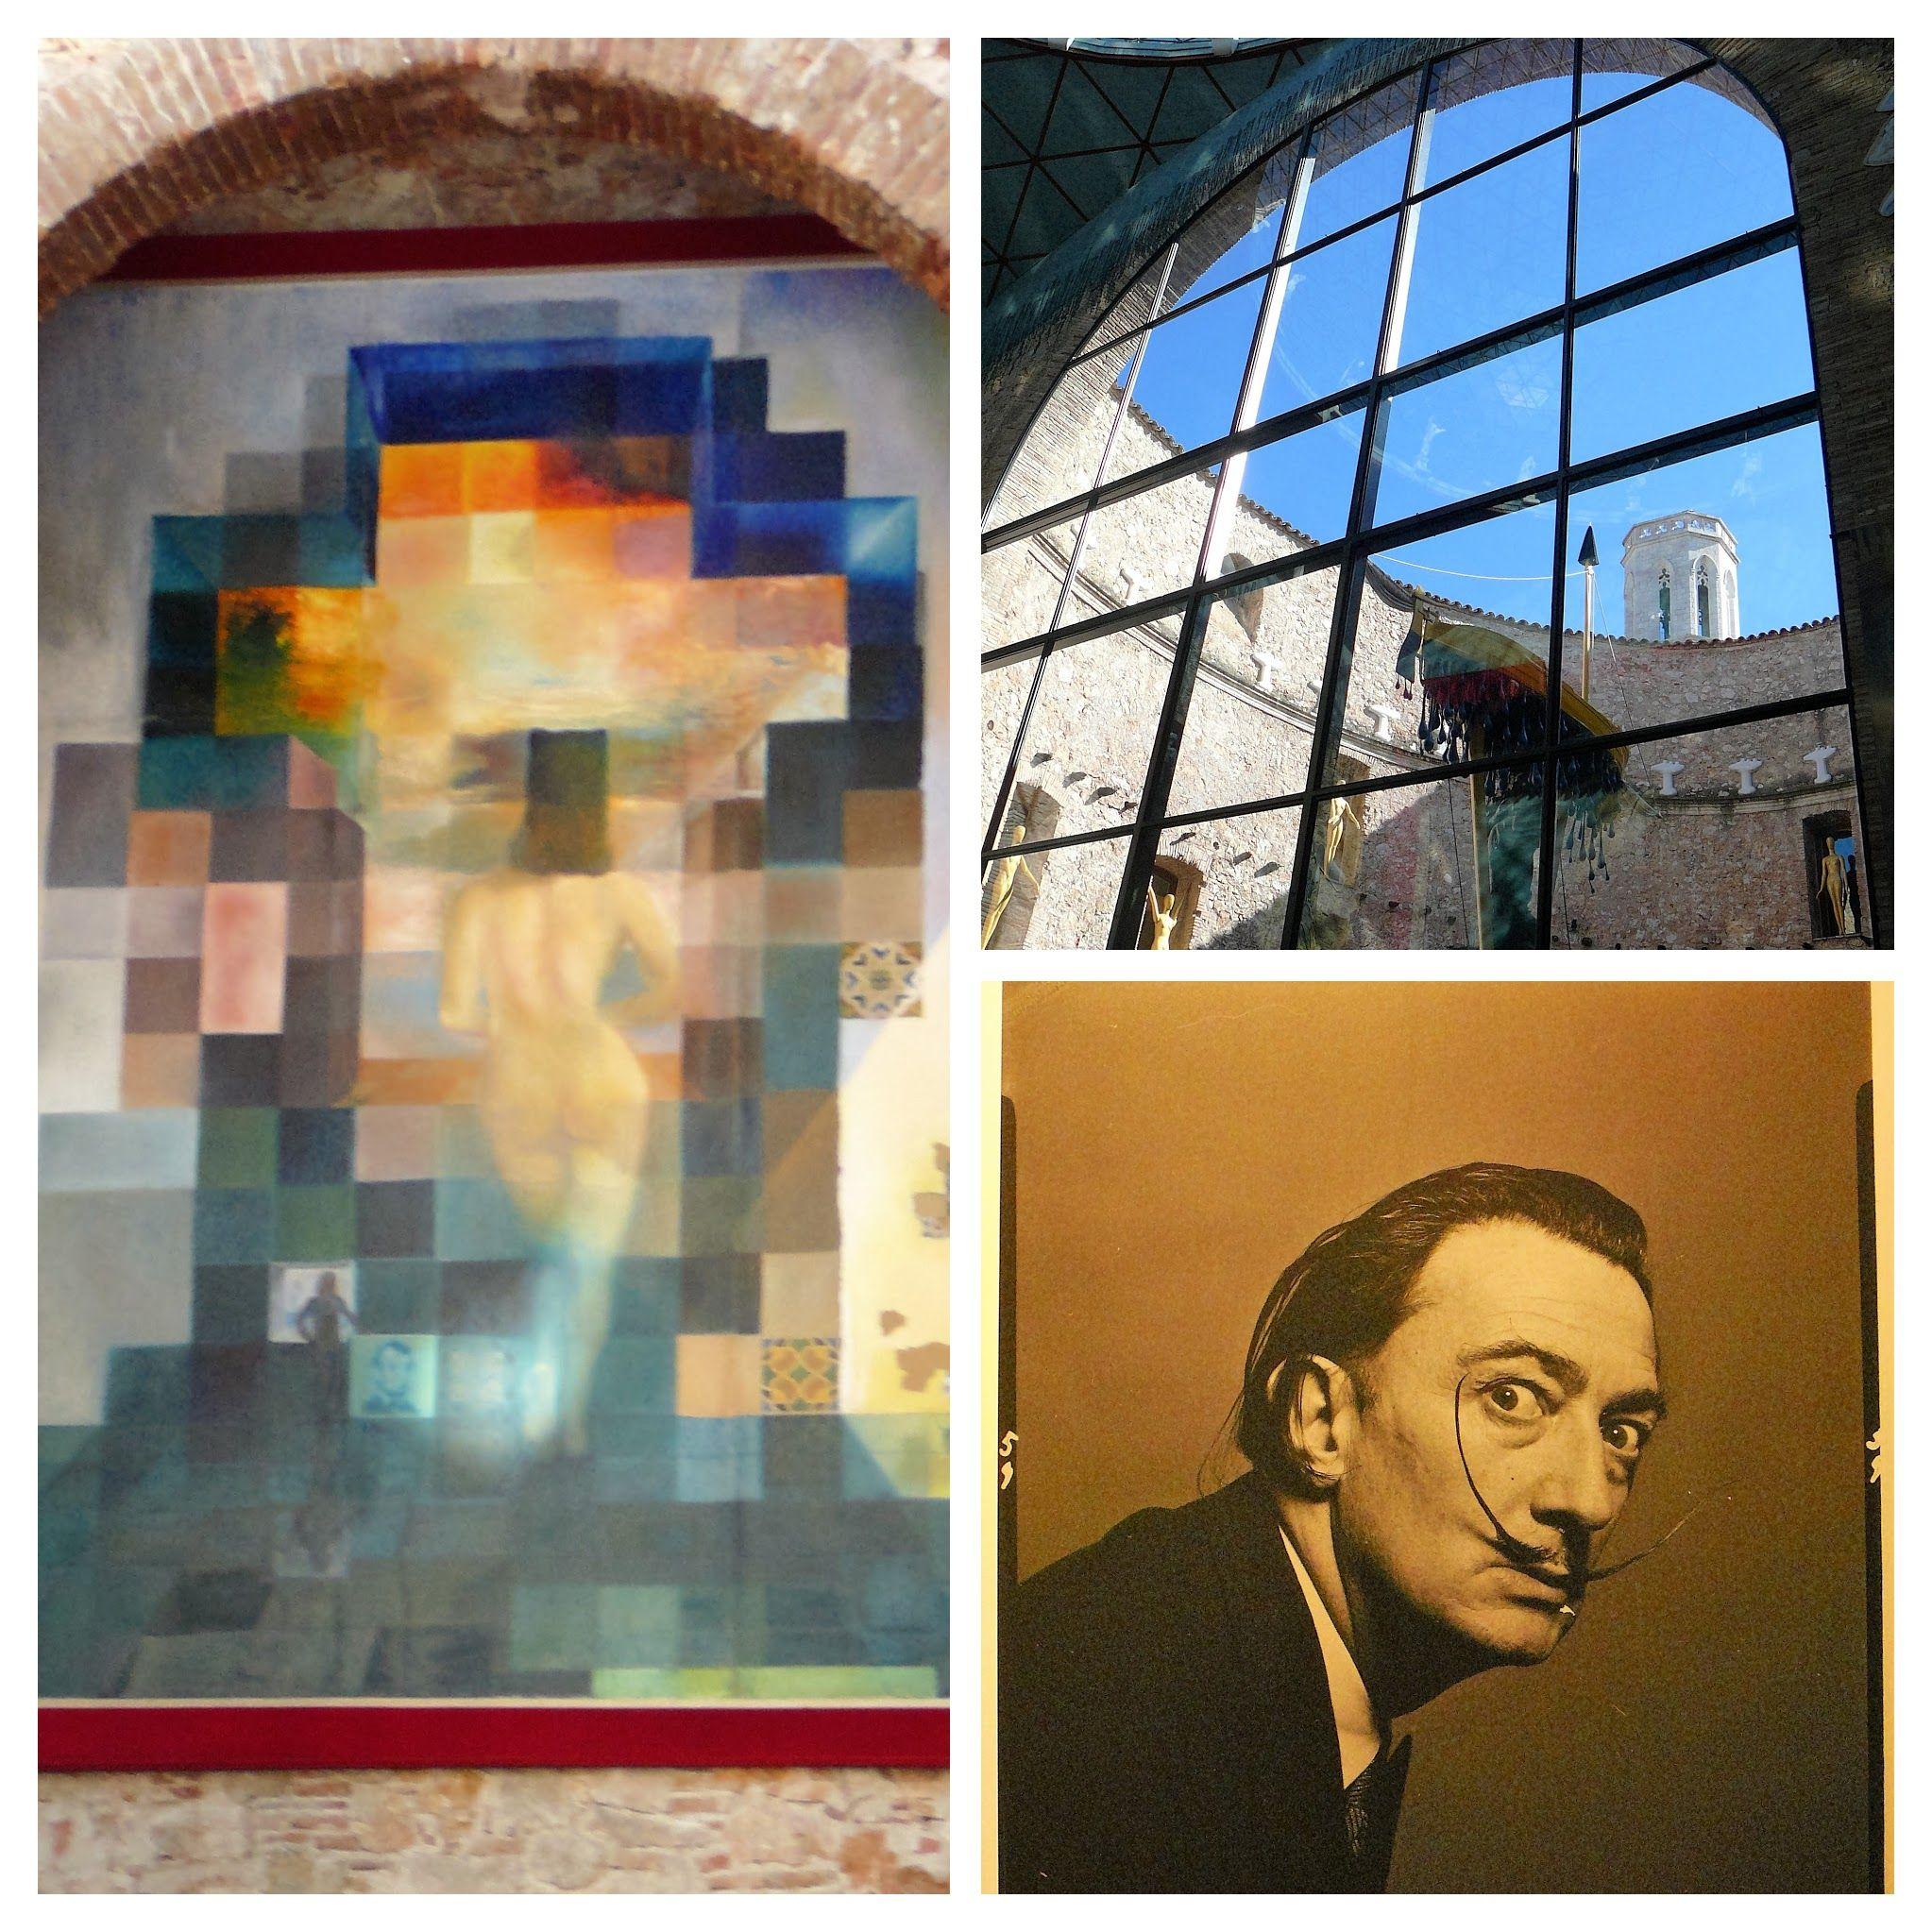 Teatro-Museu Dali, Figueres, Catalonia.